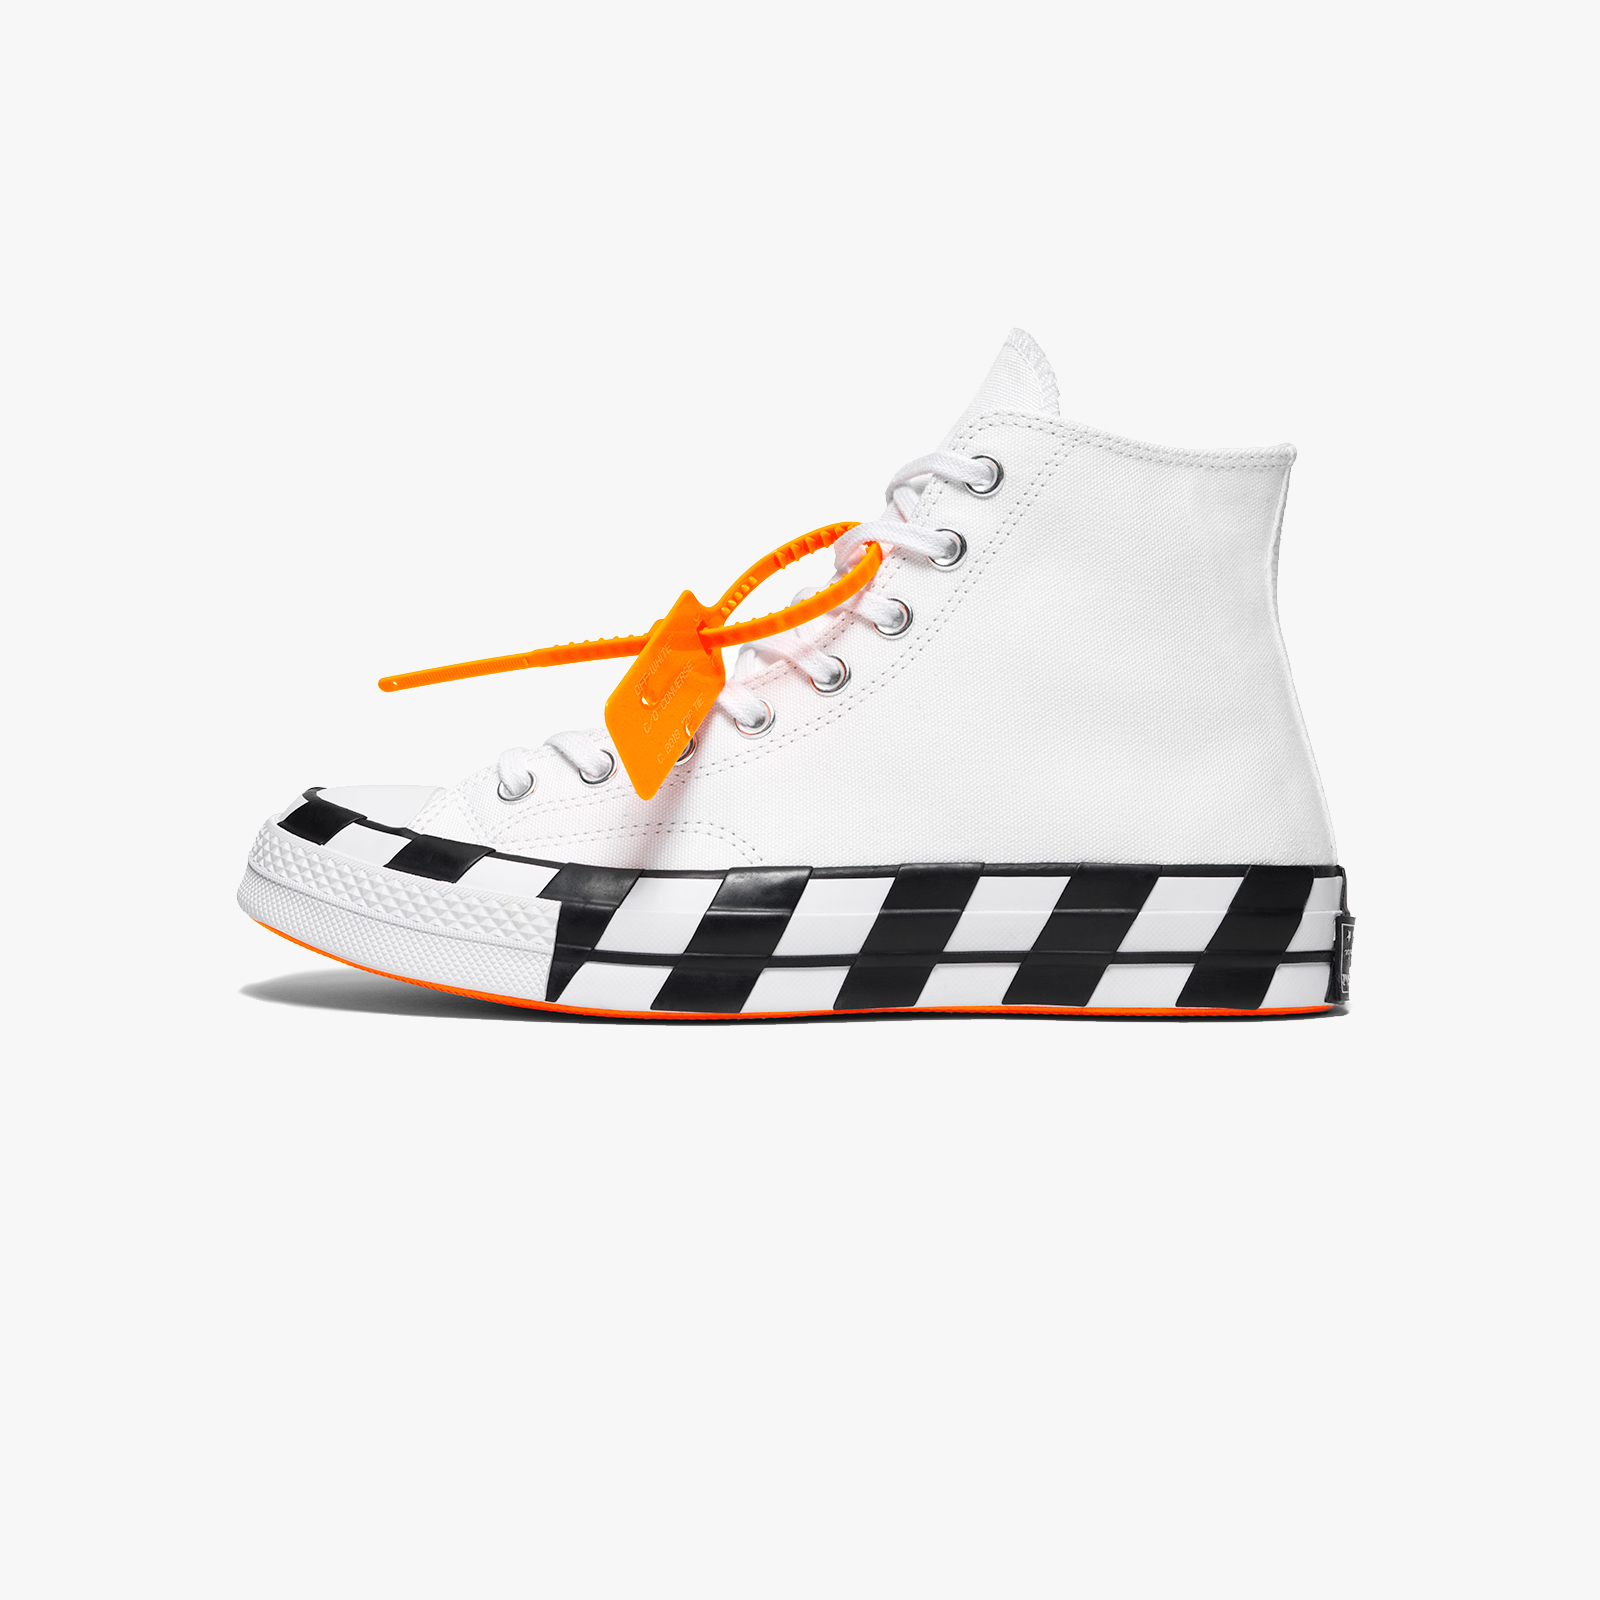 02676b4a6c2992 Converse Chuck Taylor 70 x Off White - 163862c - Sneakersnstuff ...